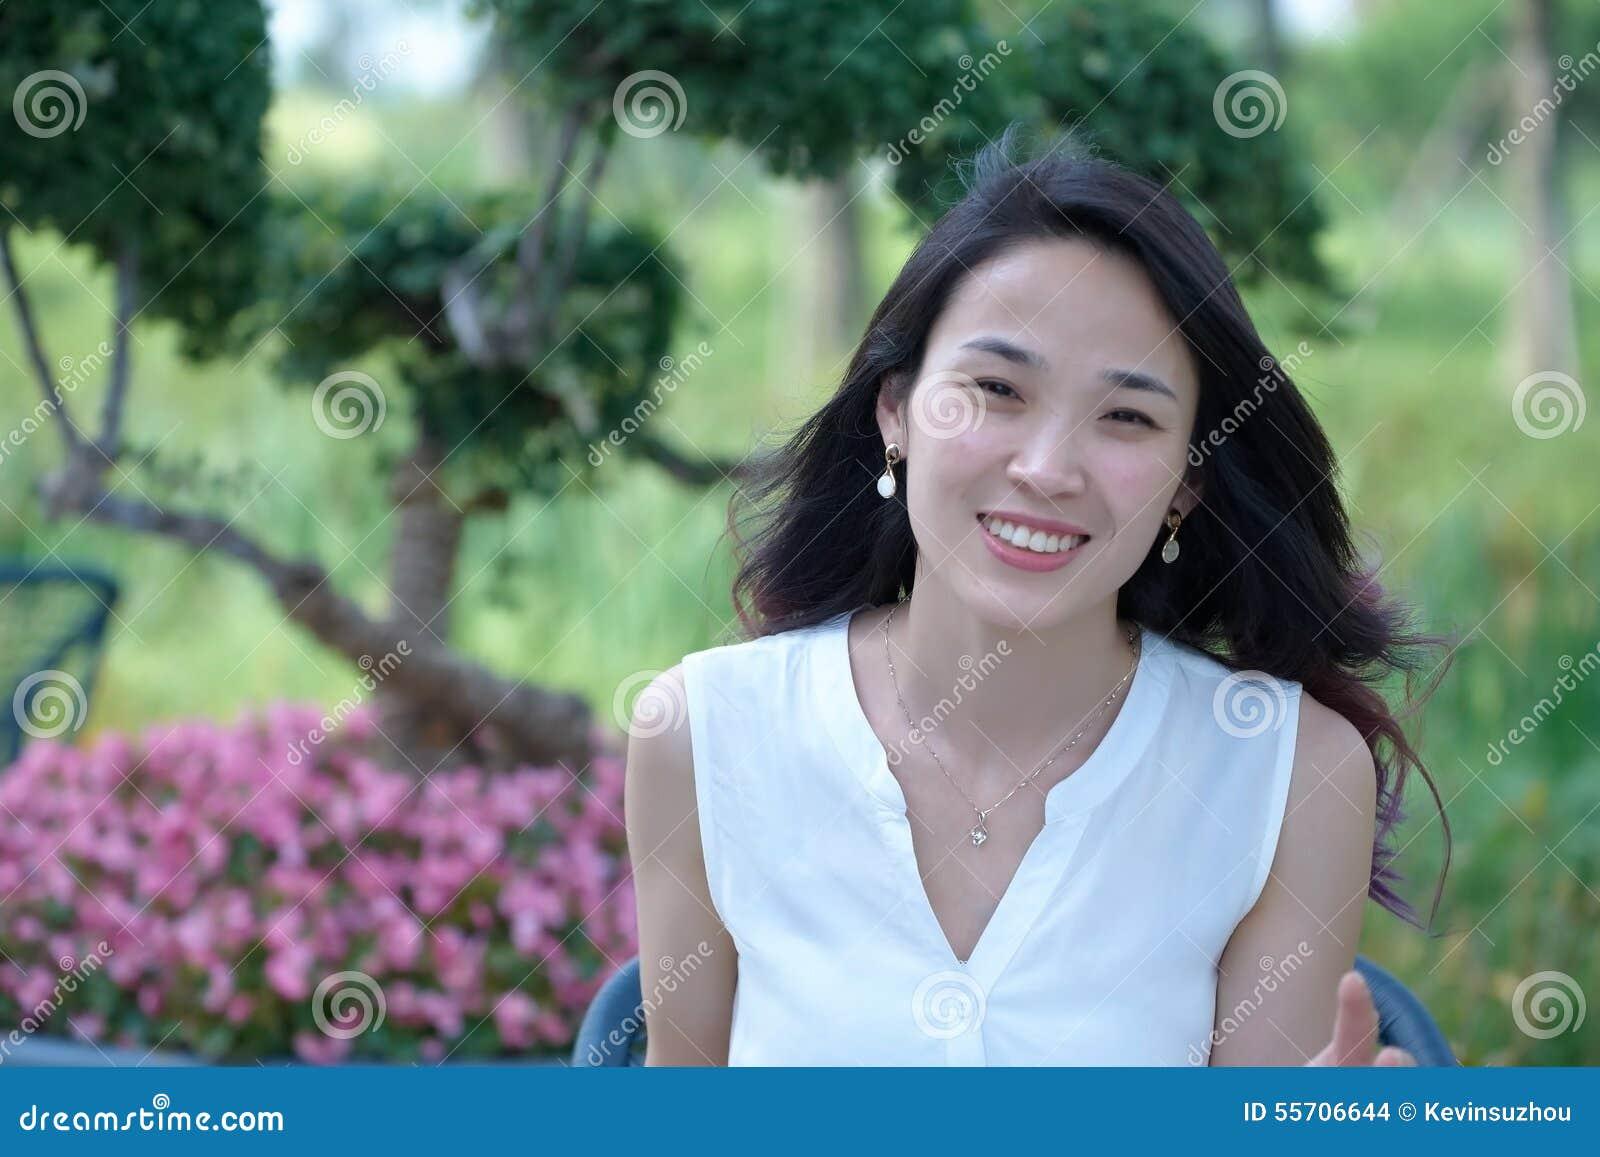 suzhou women Free to join & browse - 1000's of women in suzhou, jiangsu - interracial dating, relationships & marriage with ladies & females online.